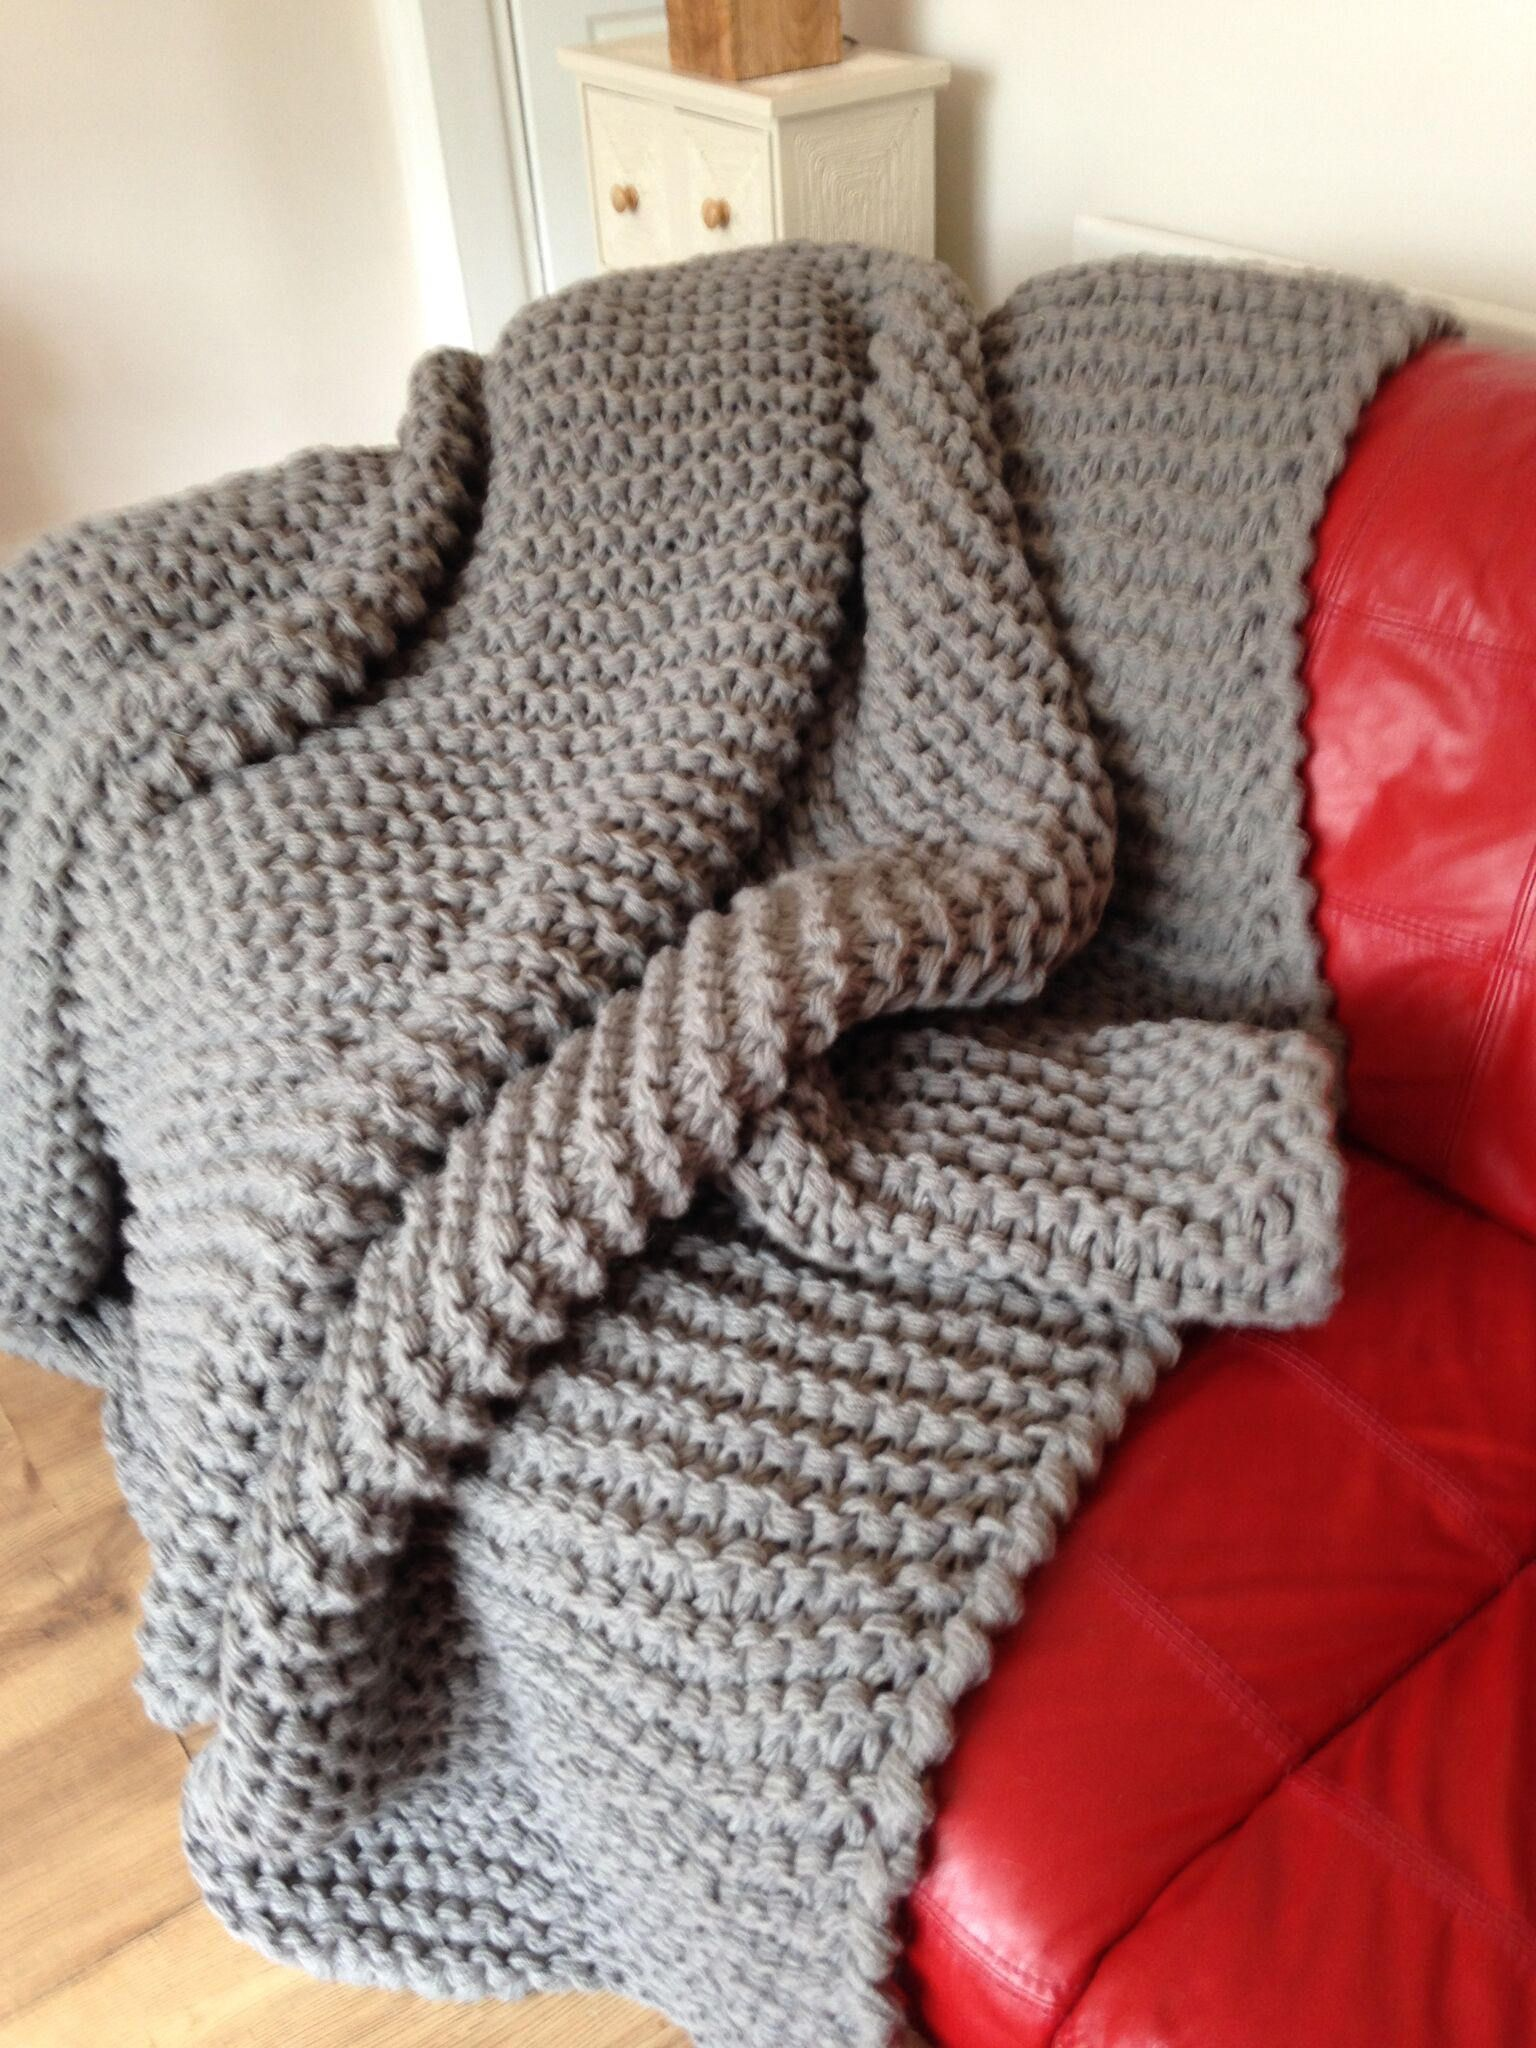 Chunky Knit Blanket Huge Knit Blanket Hand Knit Afghan Giant Yarn Super Chunky Blanket Throw Grey Lap Blanket Large Knitted Afghan Knitted Blankets Hand Knitted Throws Super Chunky Blanket